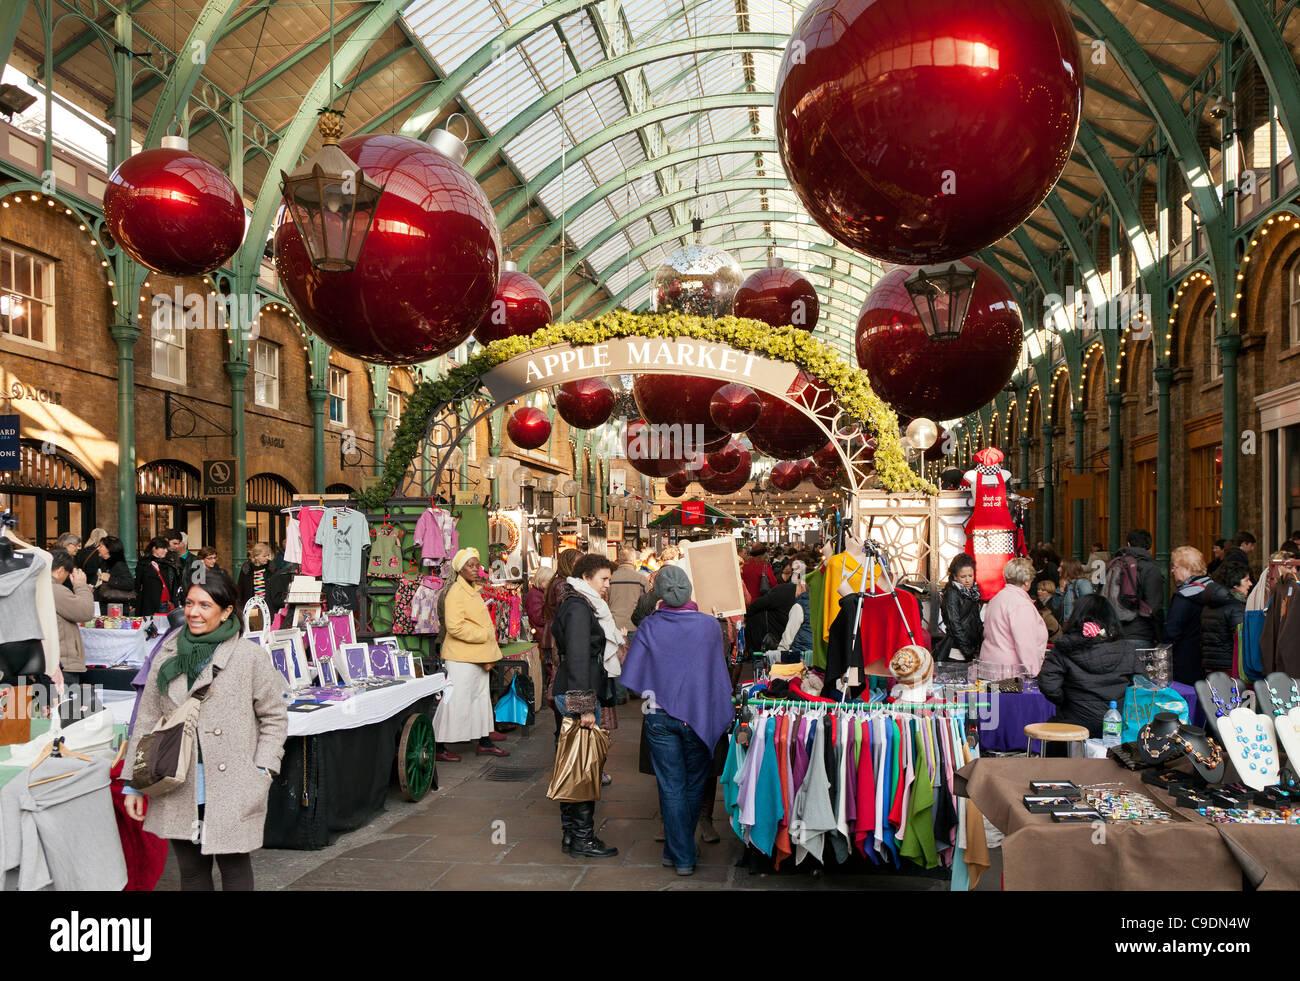 Christmas stalls at Apple Market in Covent Garden London UK - Stock Image